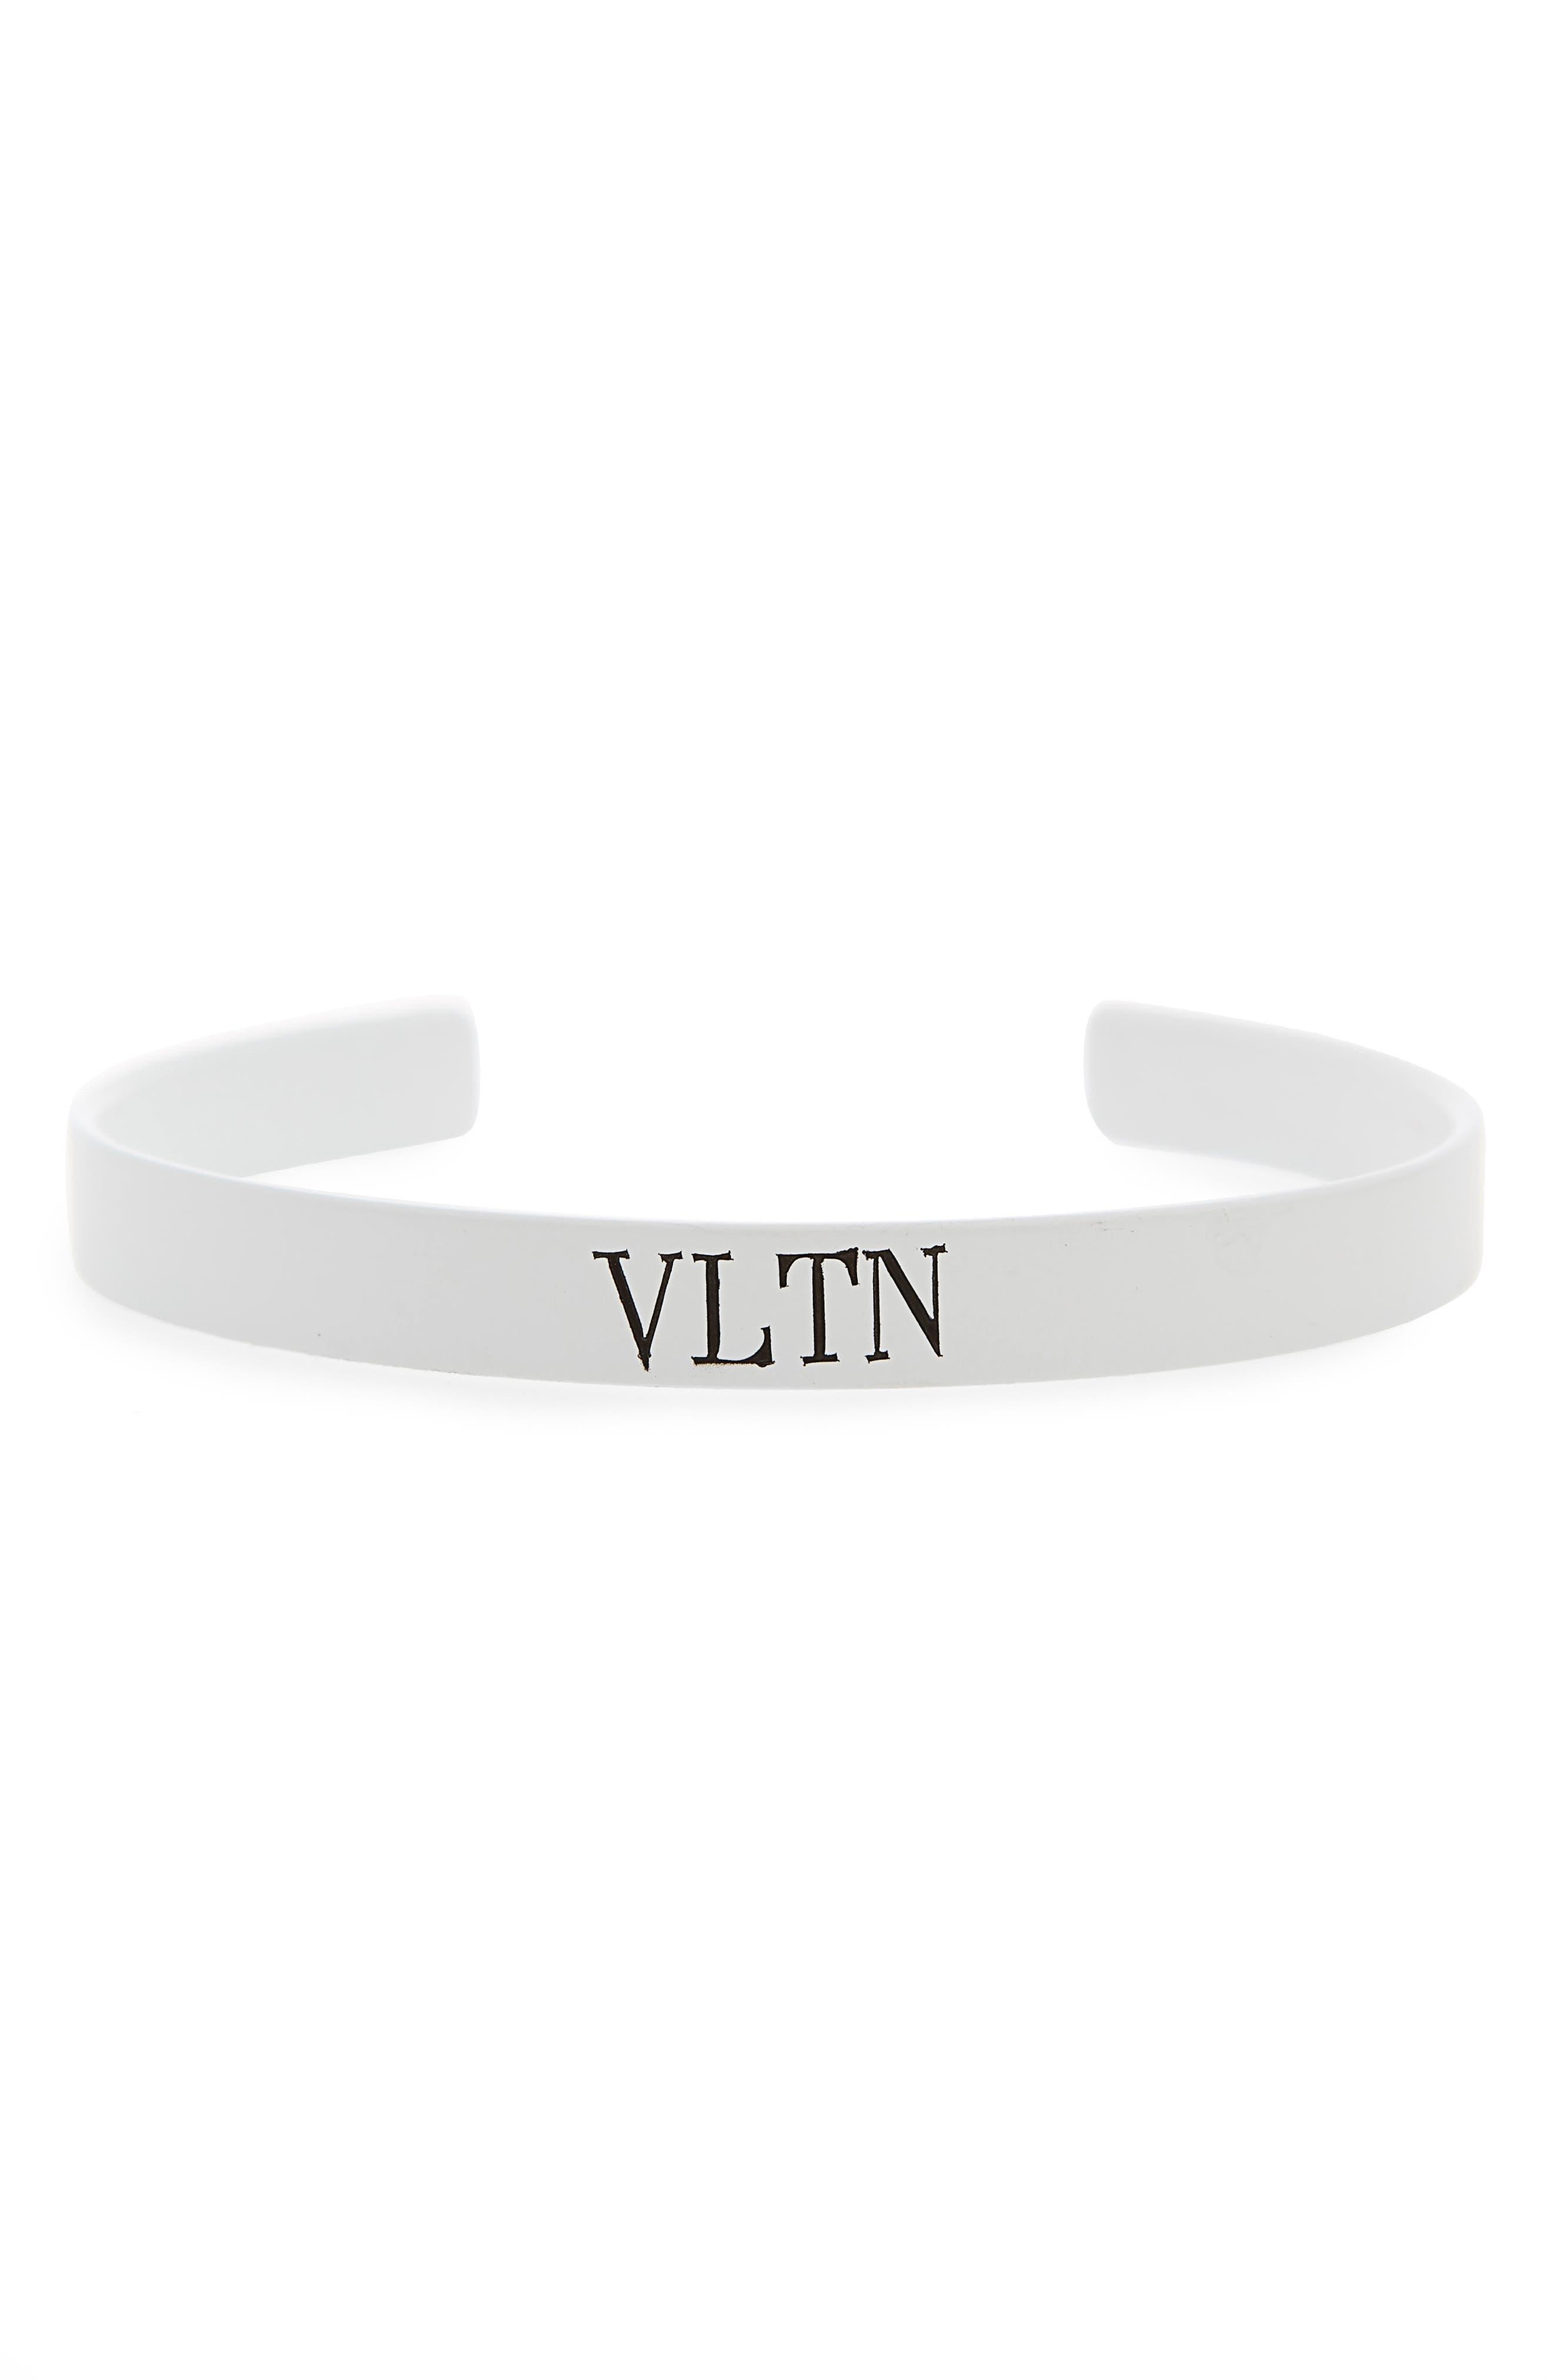 VLTN Small Cuff Bracelet,                             Main thumbnail 1, color,                             Bianco/ Nero